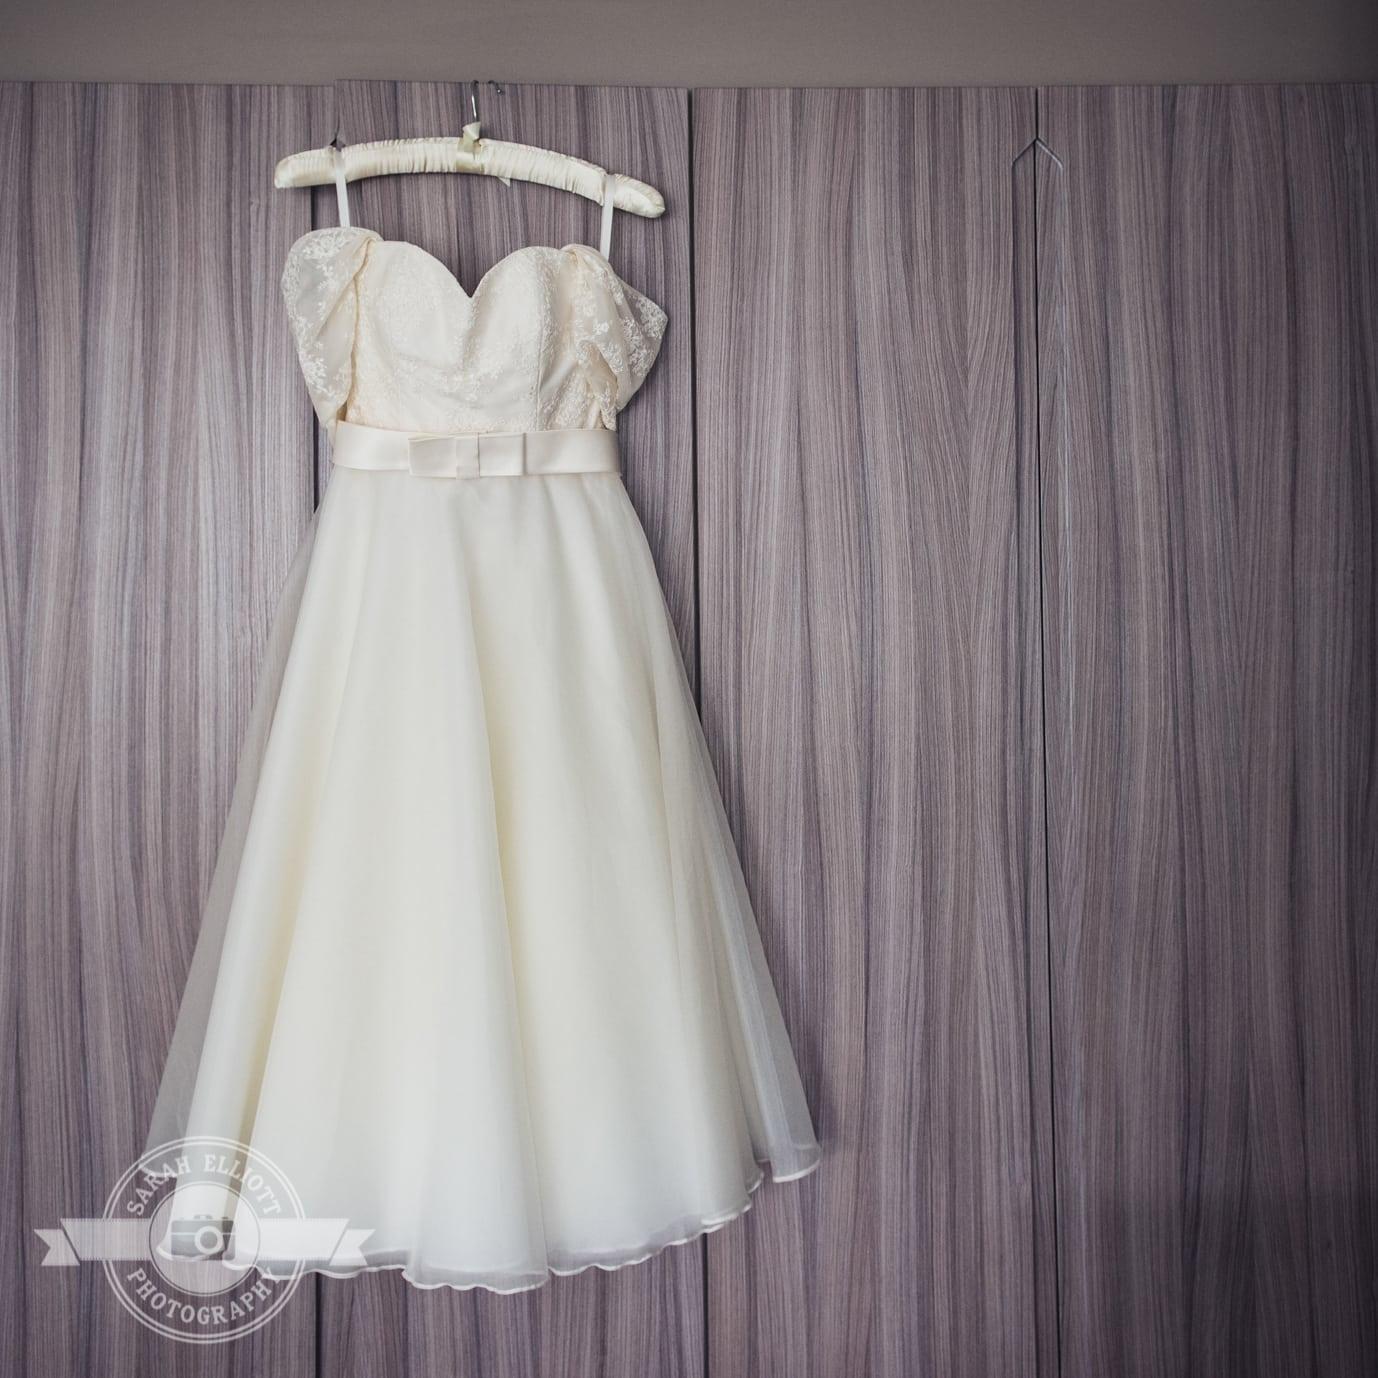 Vintage Wedding Dresses Hertfordshire: Wedding At Lauderdale House, London